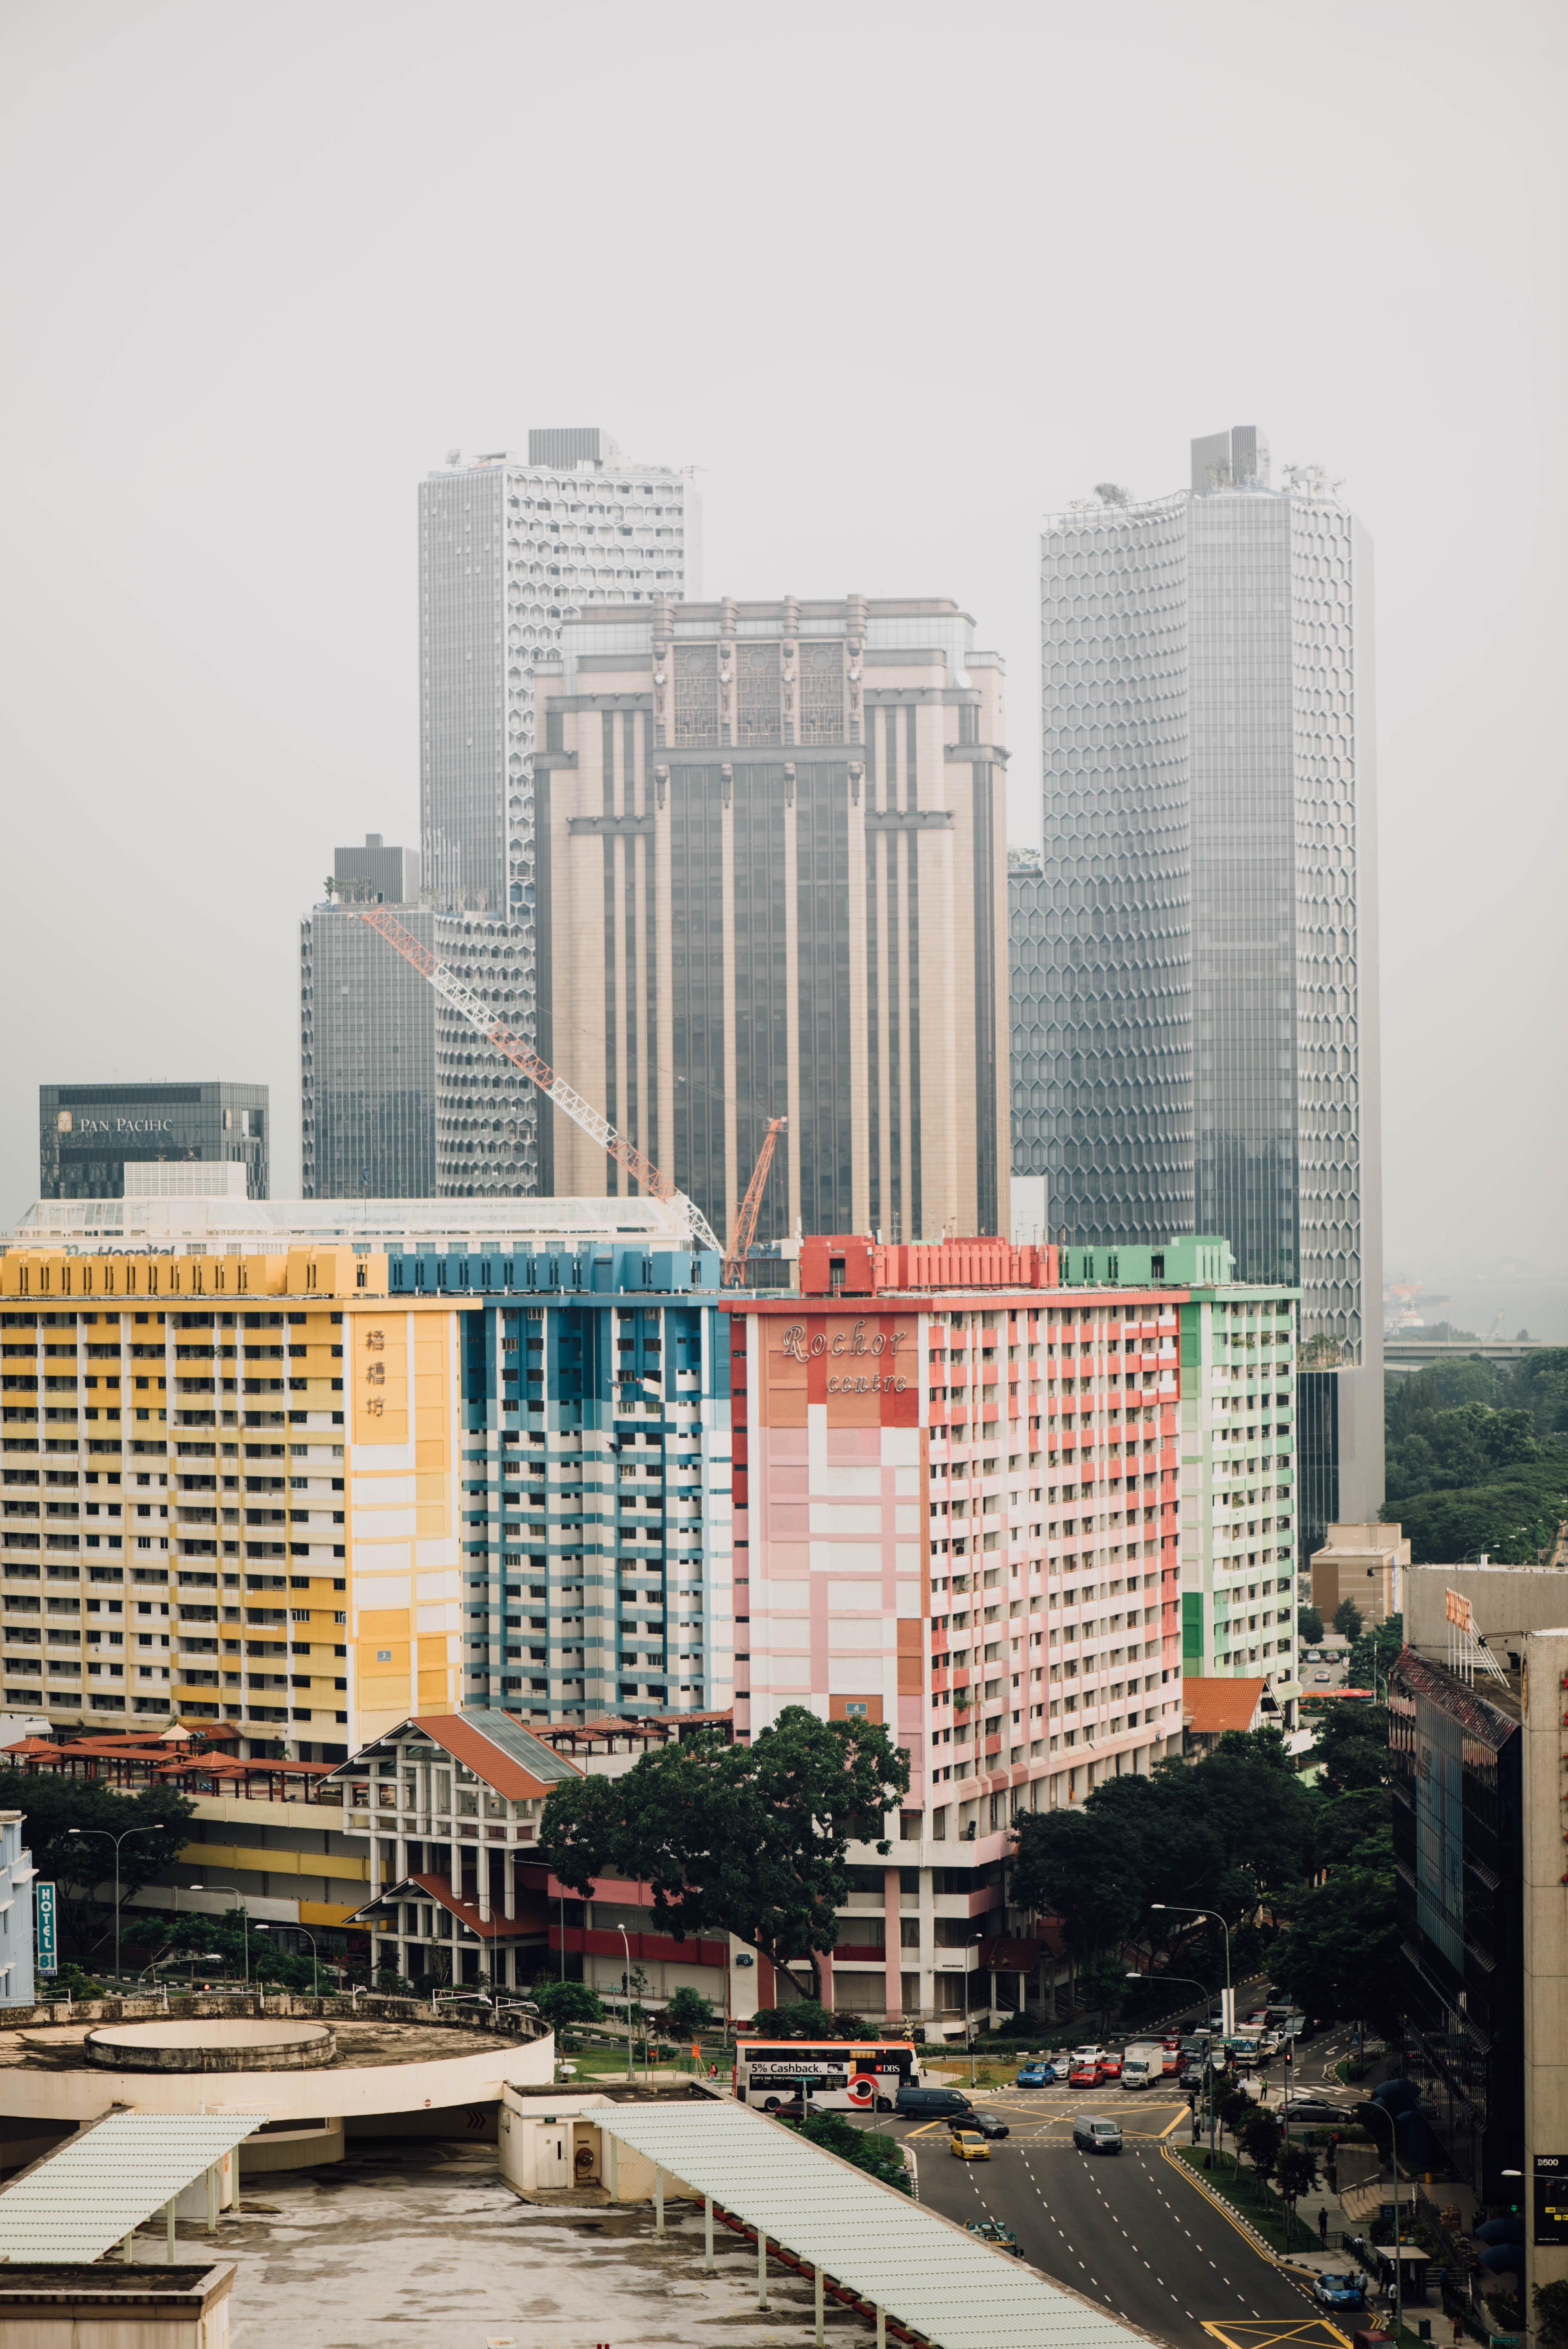 multicolored concrete high rise building near water